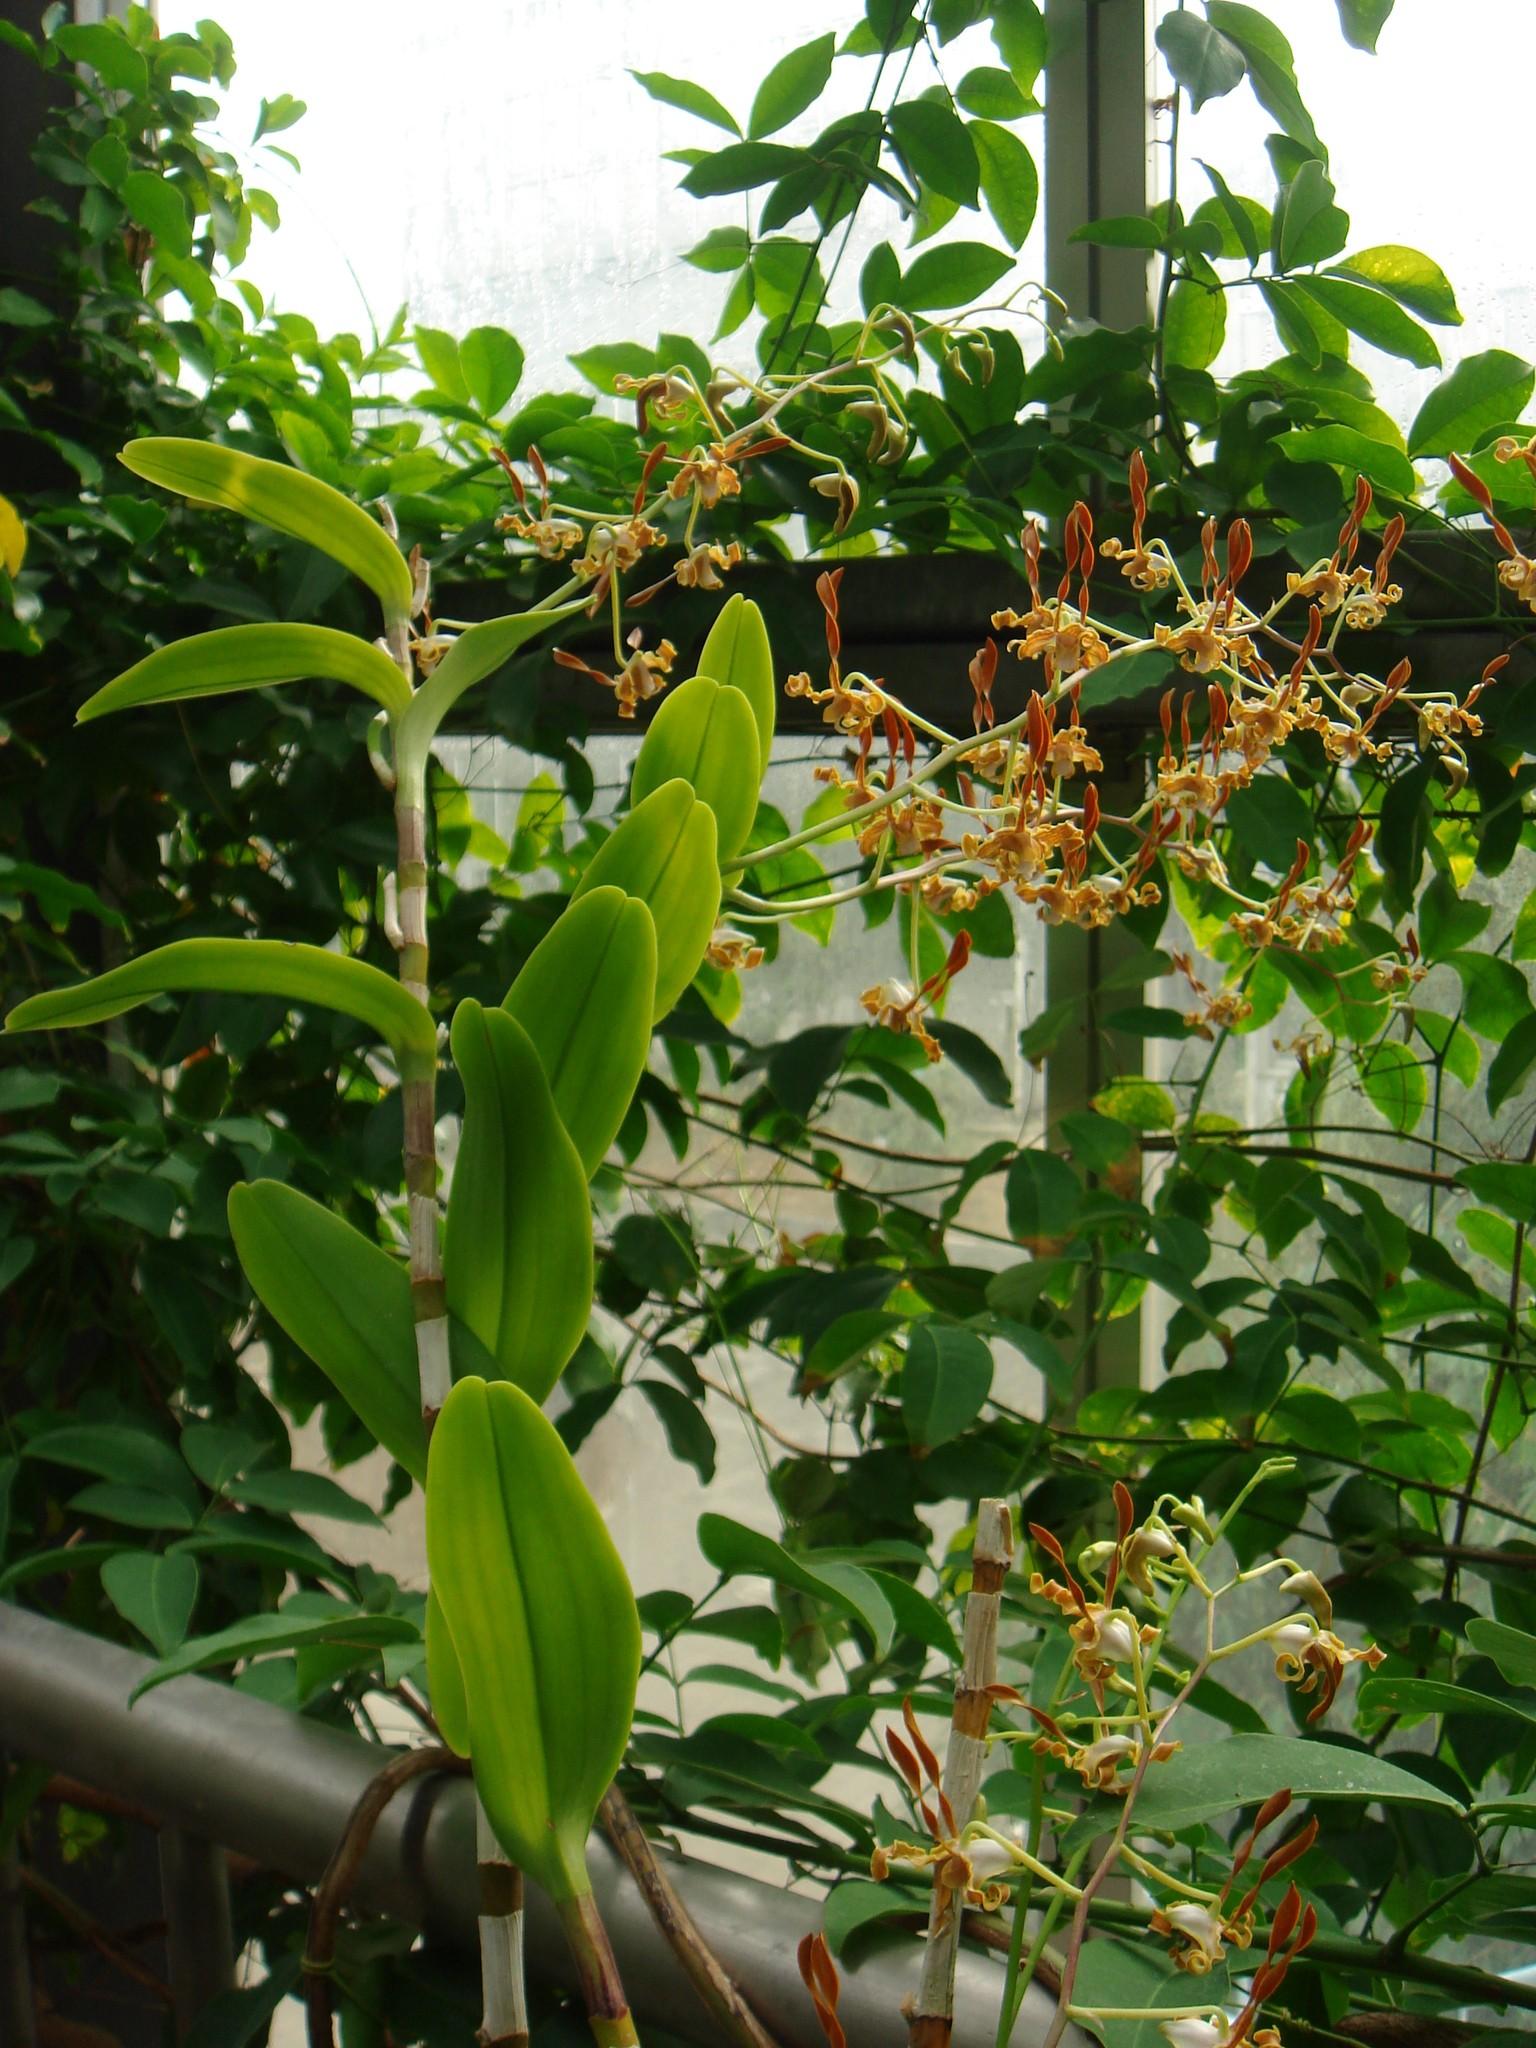 http://orchids.la.coocan.jp/Dendrobium/Dendrobium%20tangerinum/DSC04240.JPG